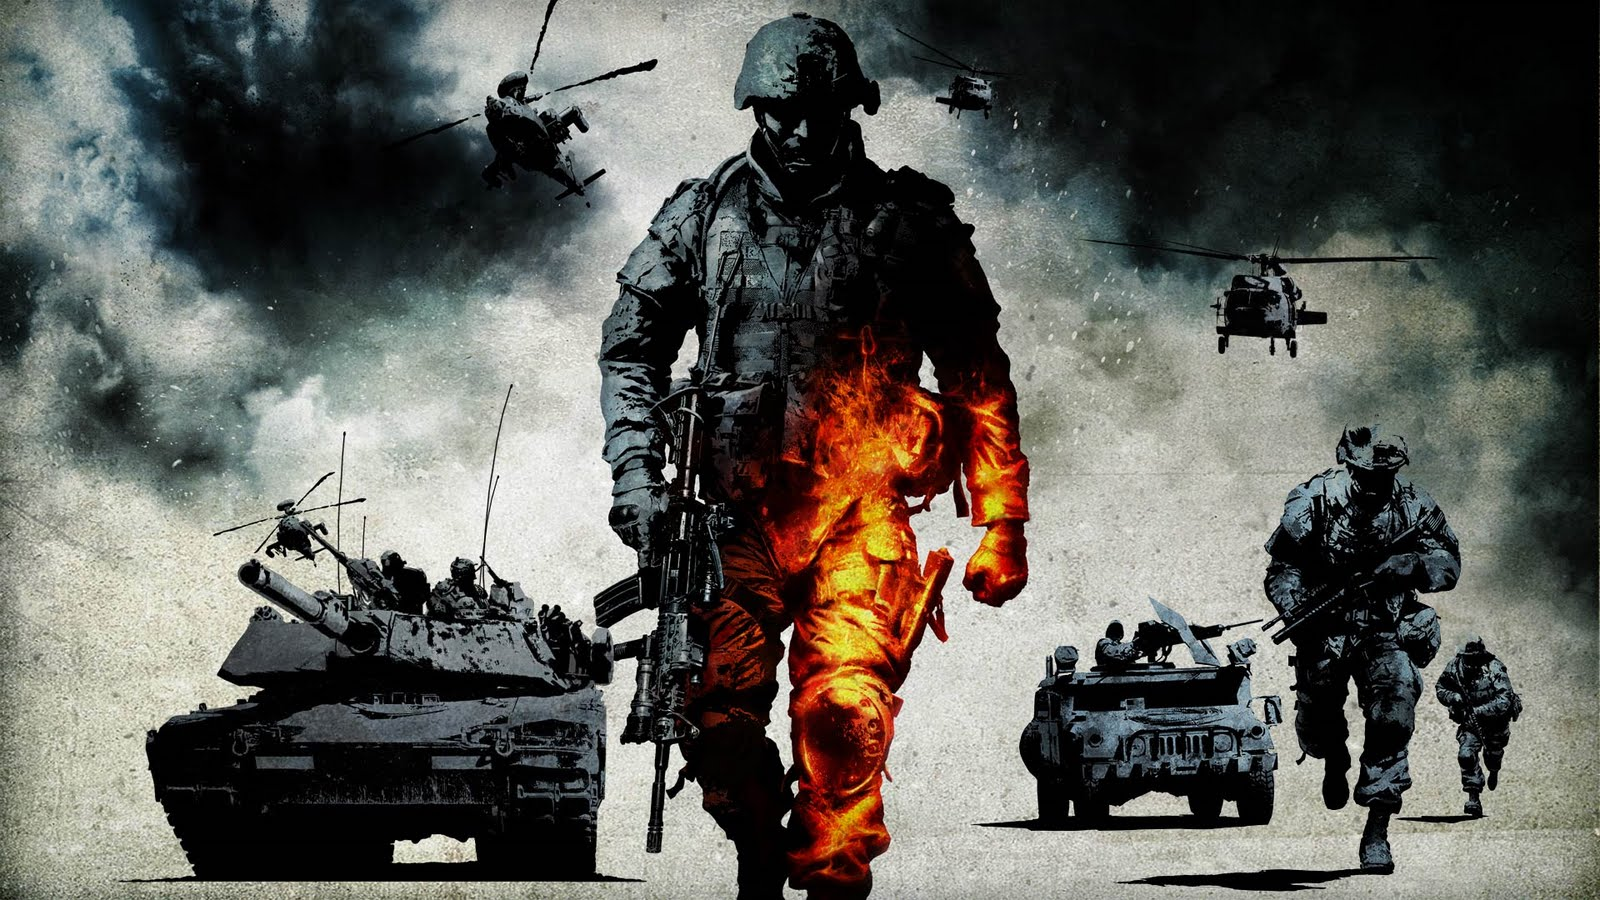 http://4.bp.blogspot.com/-3l9KXYVPV08/UNSoBS6EILI/AAAAAAAABP0/NMJmPG3TeGM/s1600/Battlefield+3+Wallpaper+HD.jpg